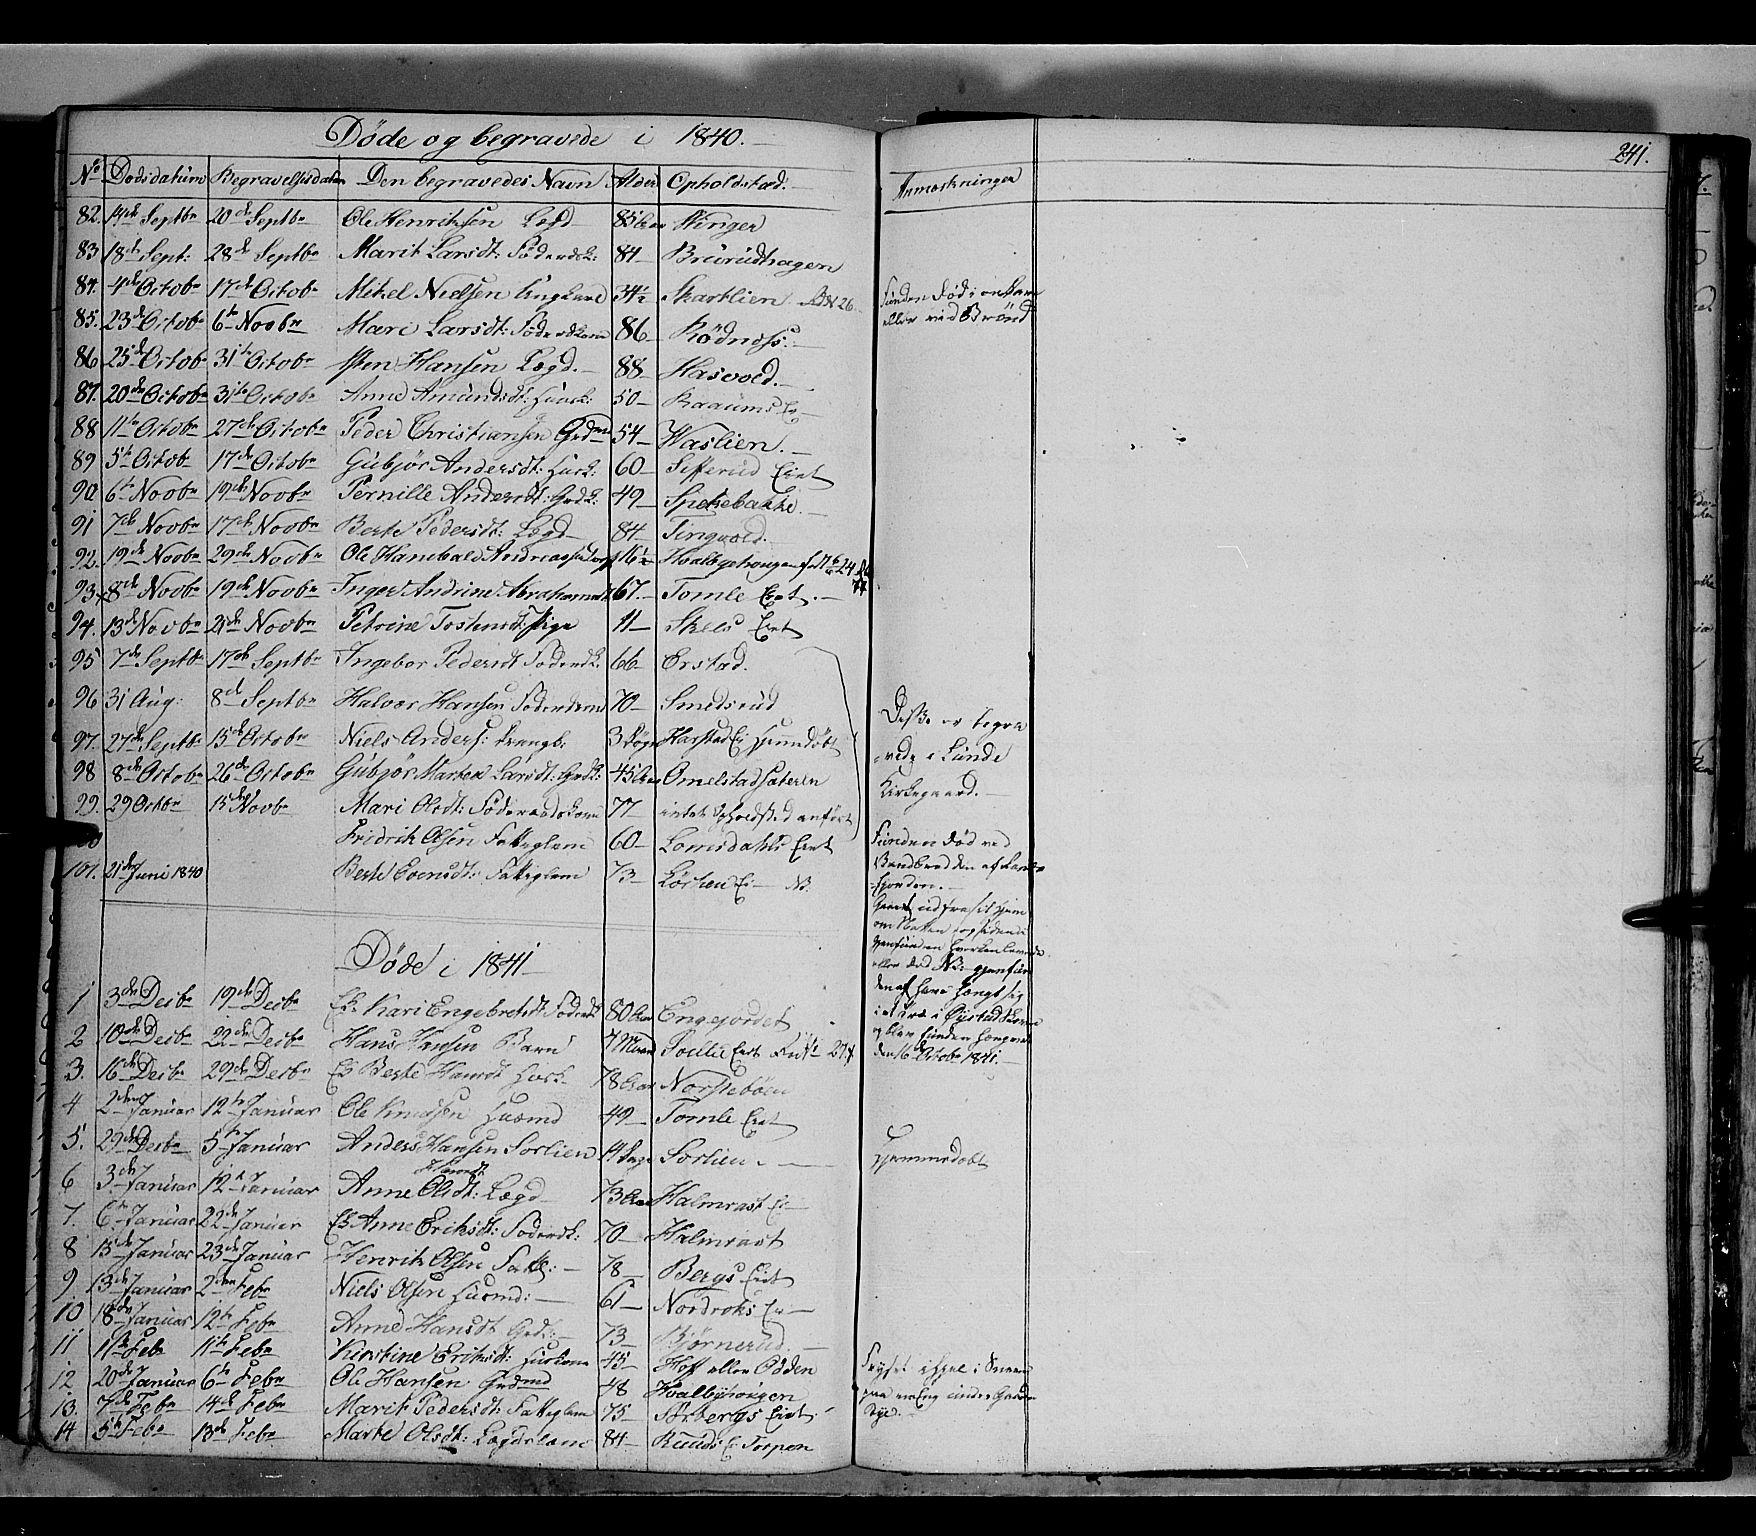 SAH, Land prestekontor, Klokkerbok nr. 2, 1833-1849, s. 241